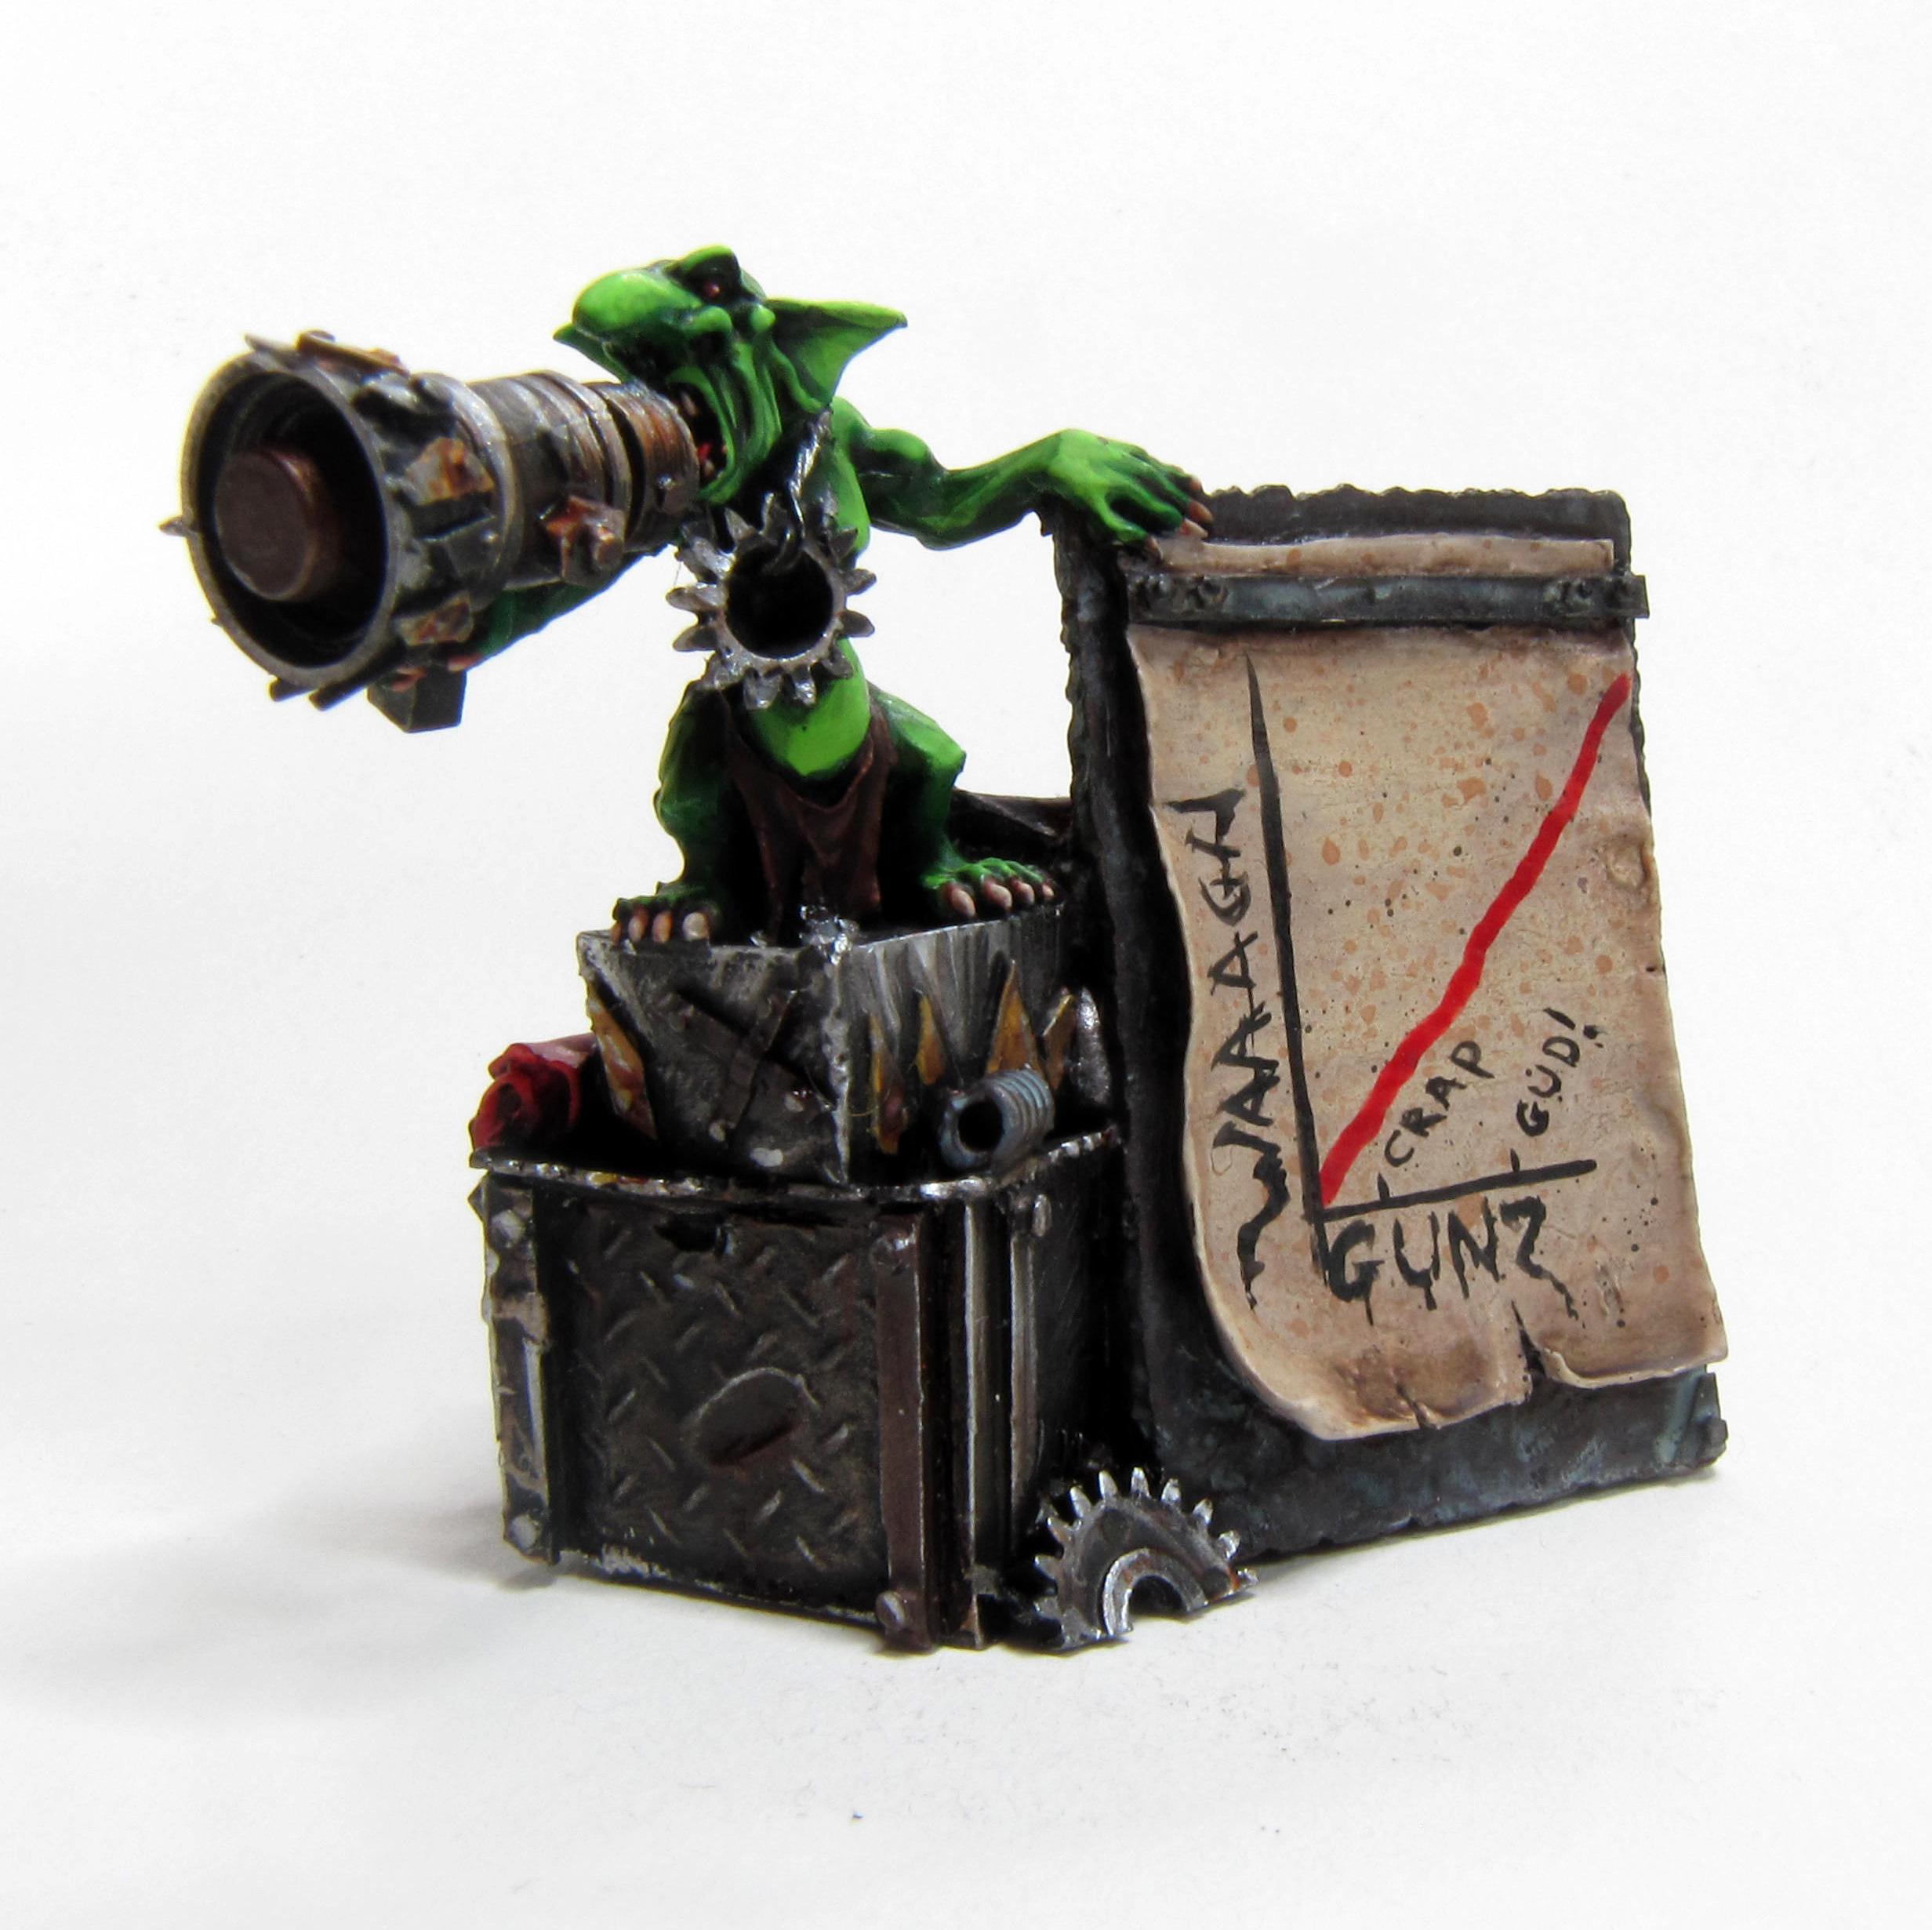 Green, Grots, Orcs, Orks, Warhammer 40,000